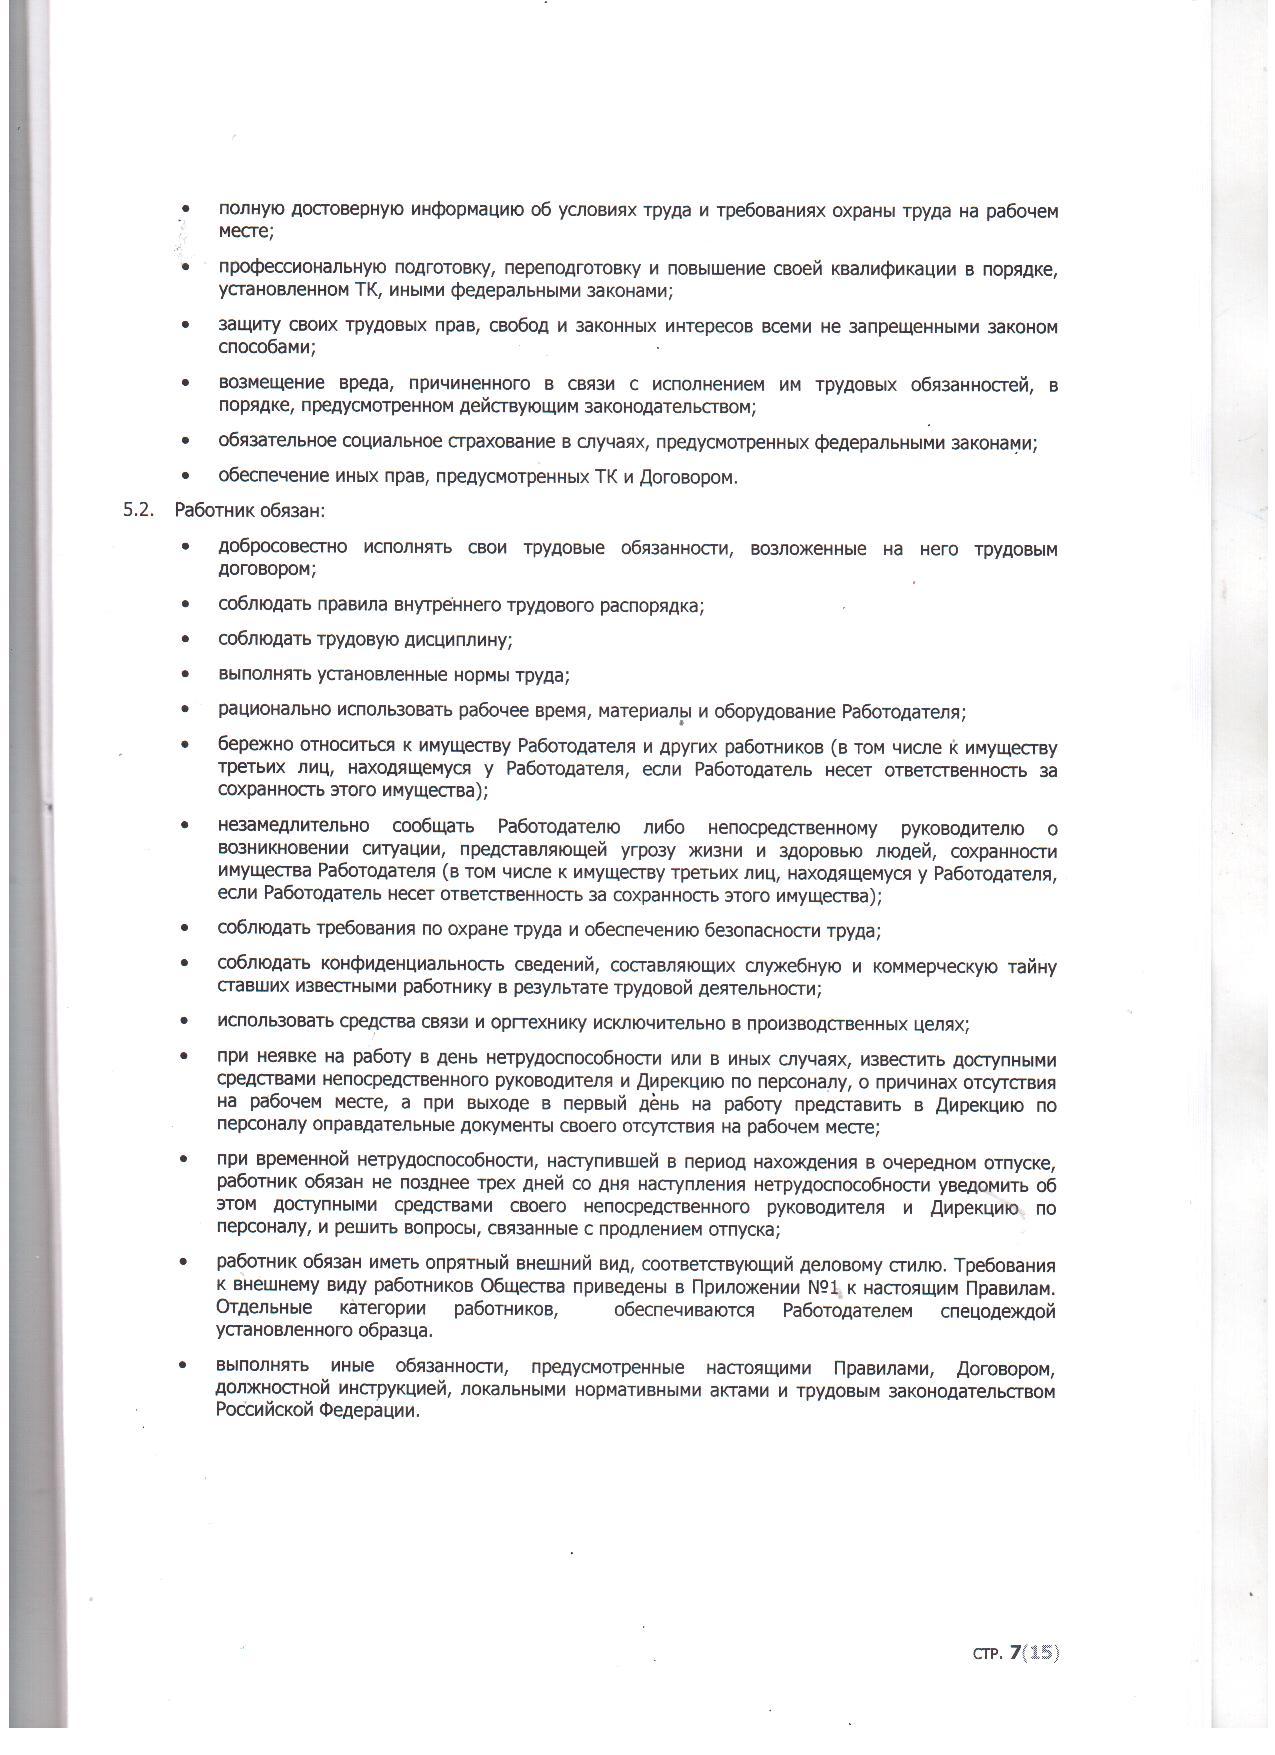 Правила внутреннего трудоговоро распорядка 7